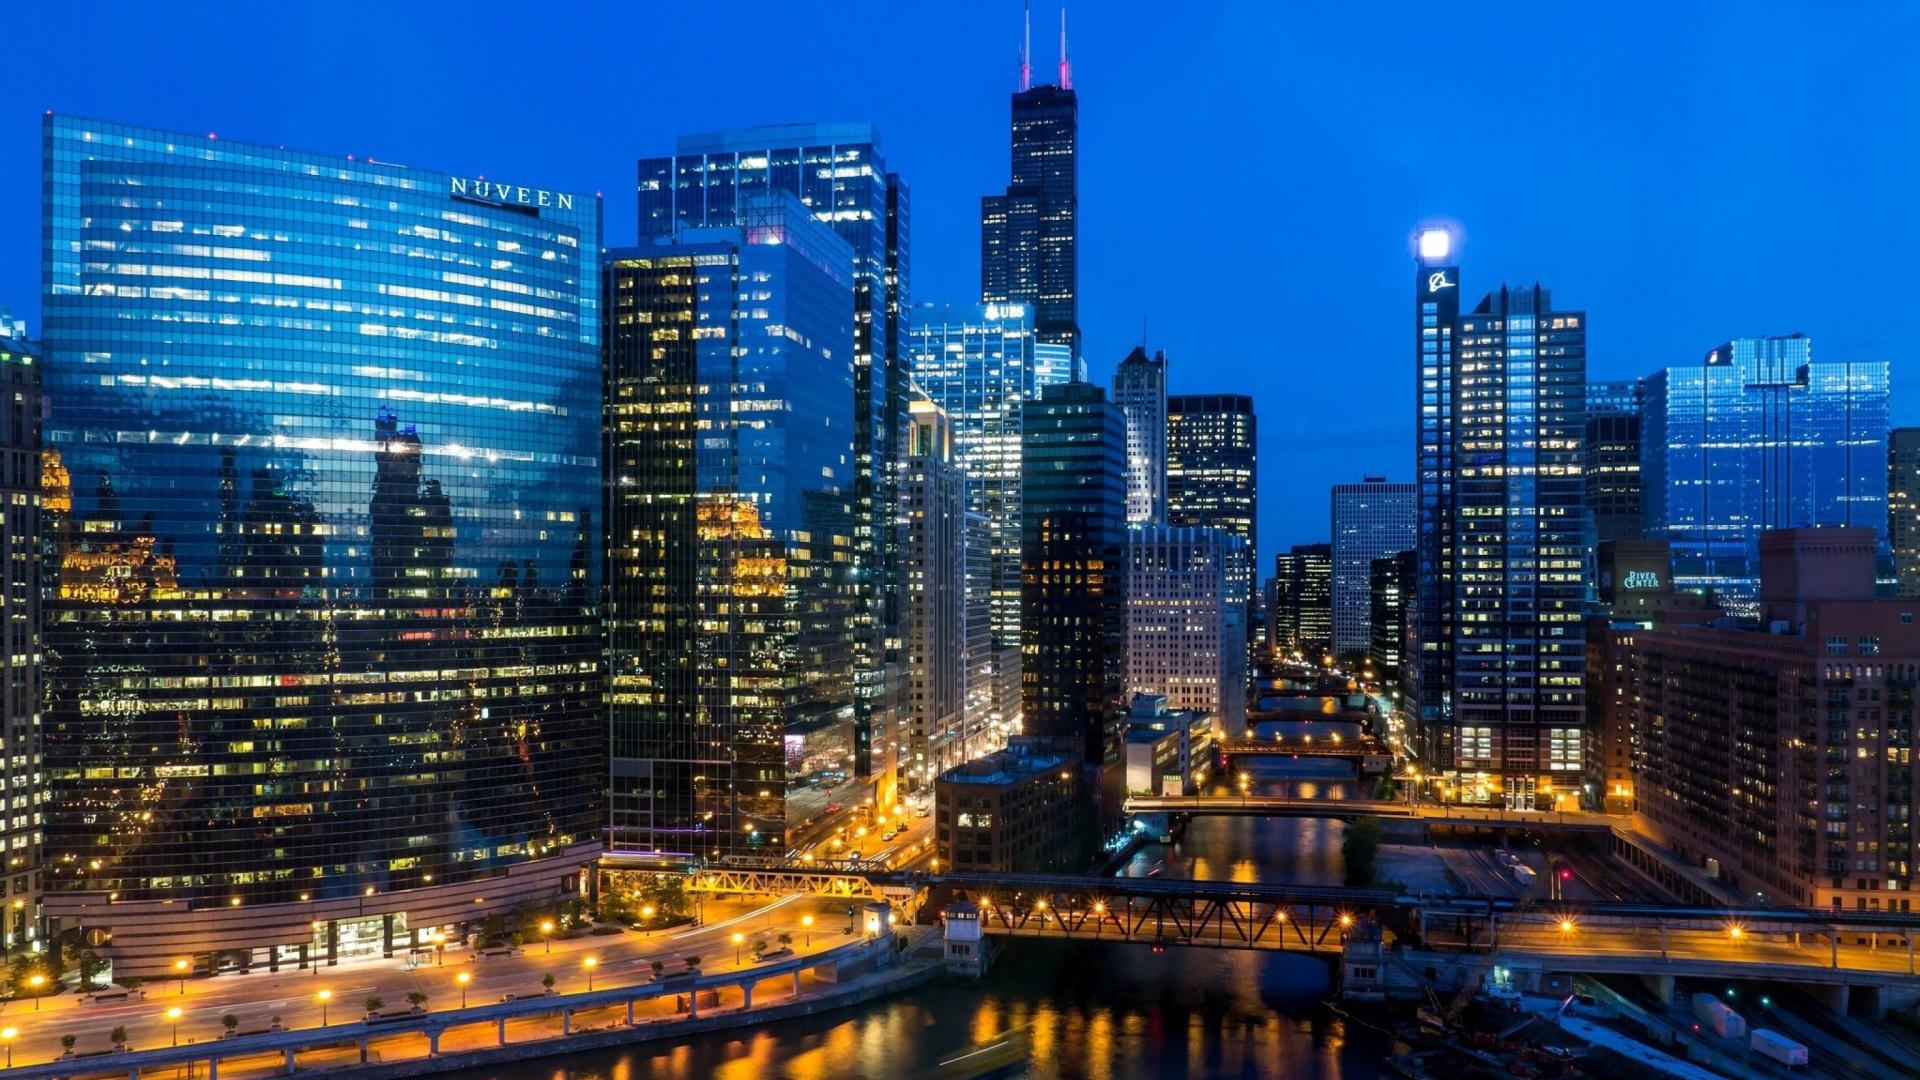 Snapchat Willis Tower in Chicago Wallpaper for Desktop ...